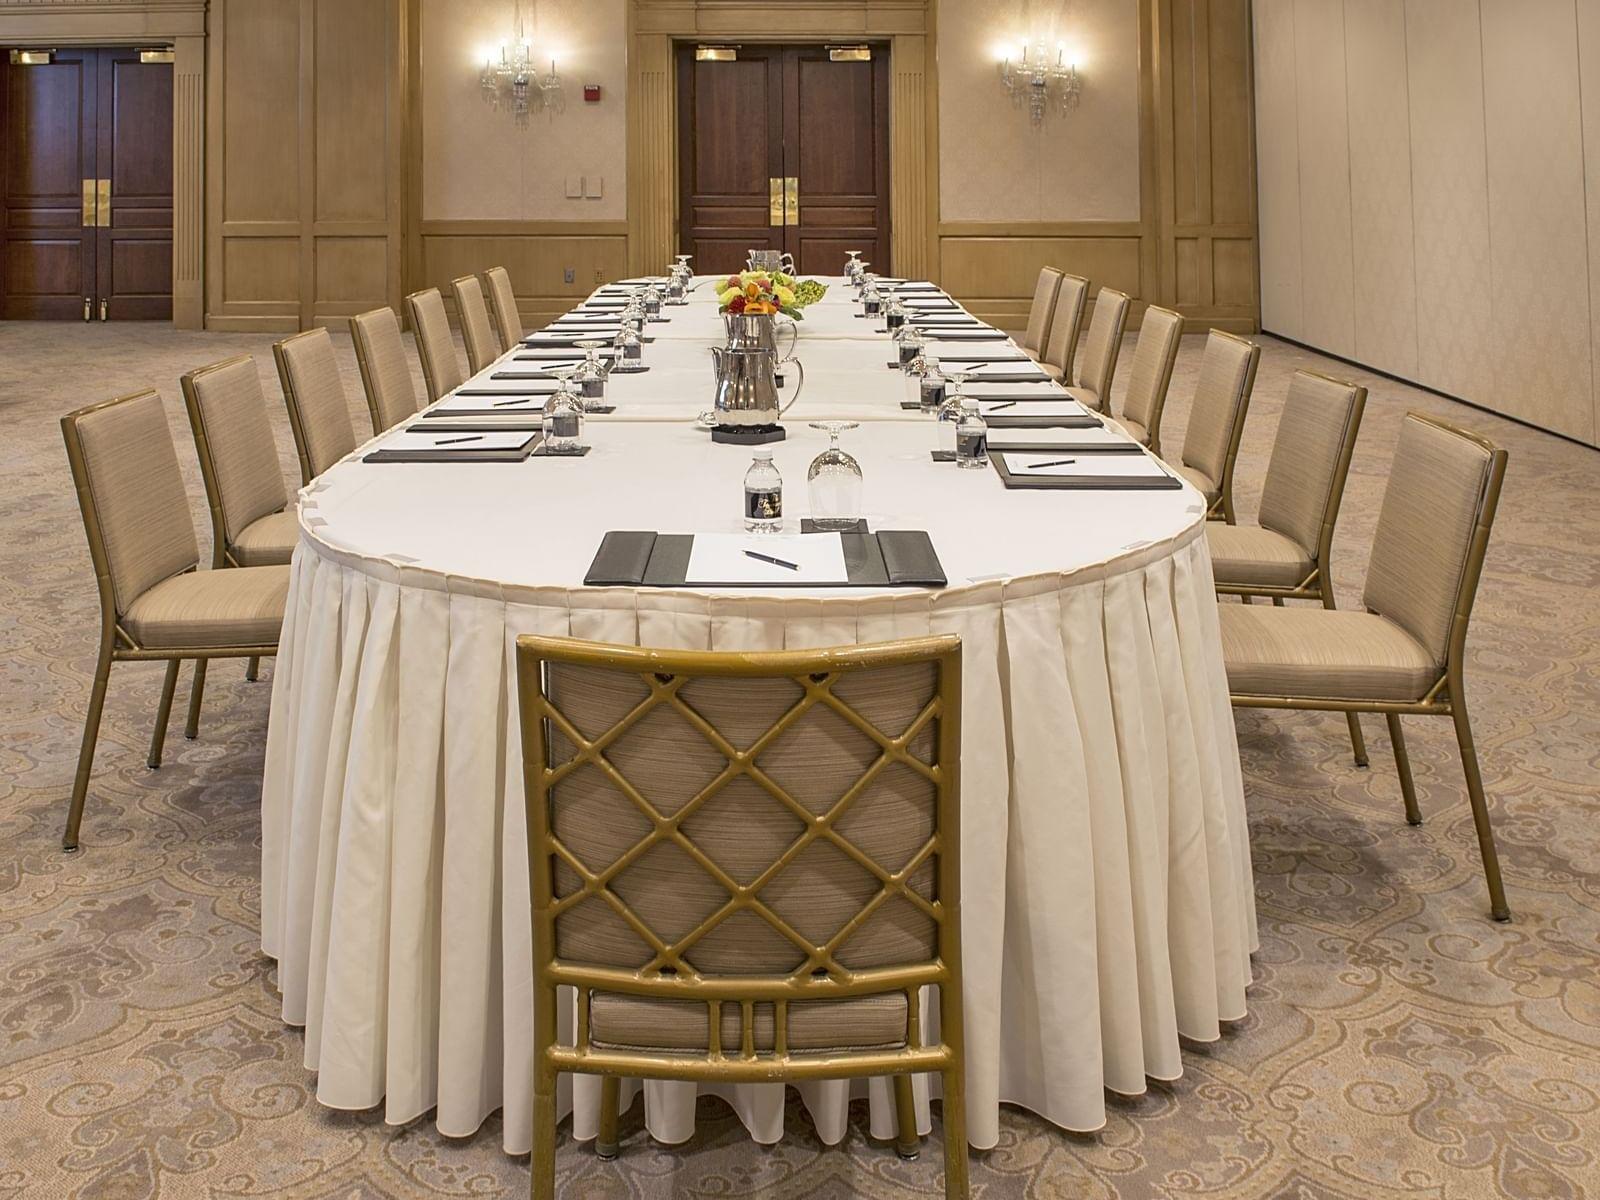 long table in a beautiful ballroom